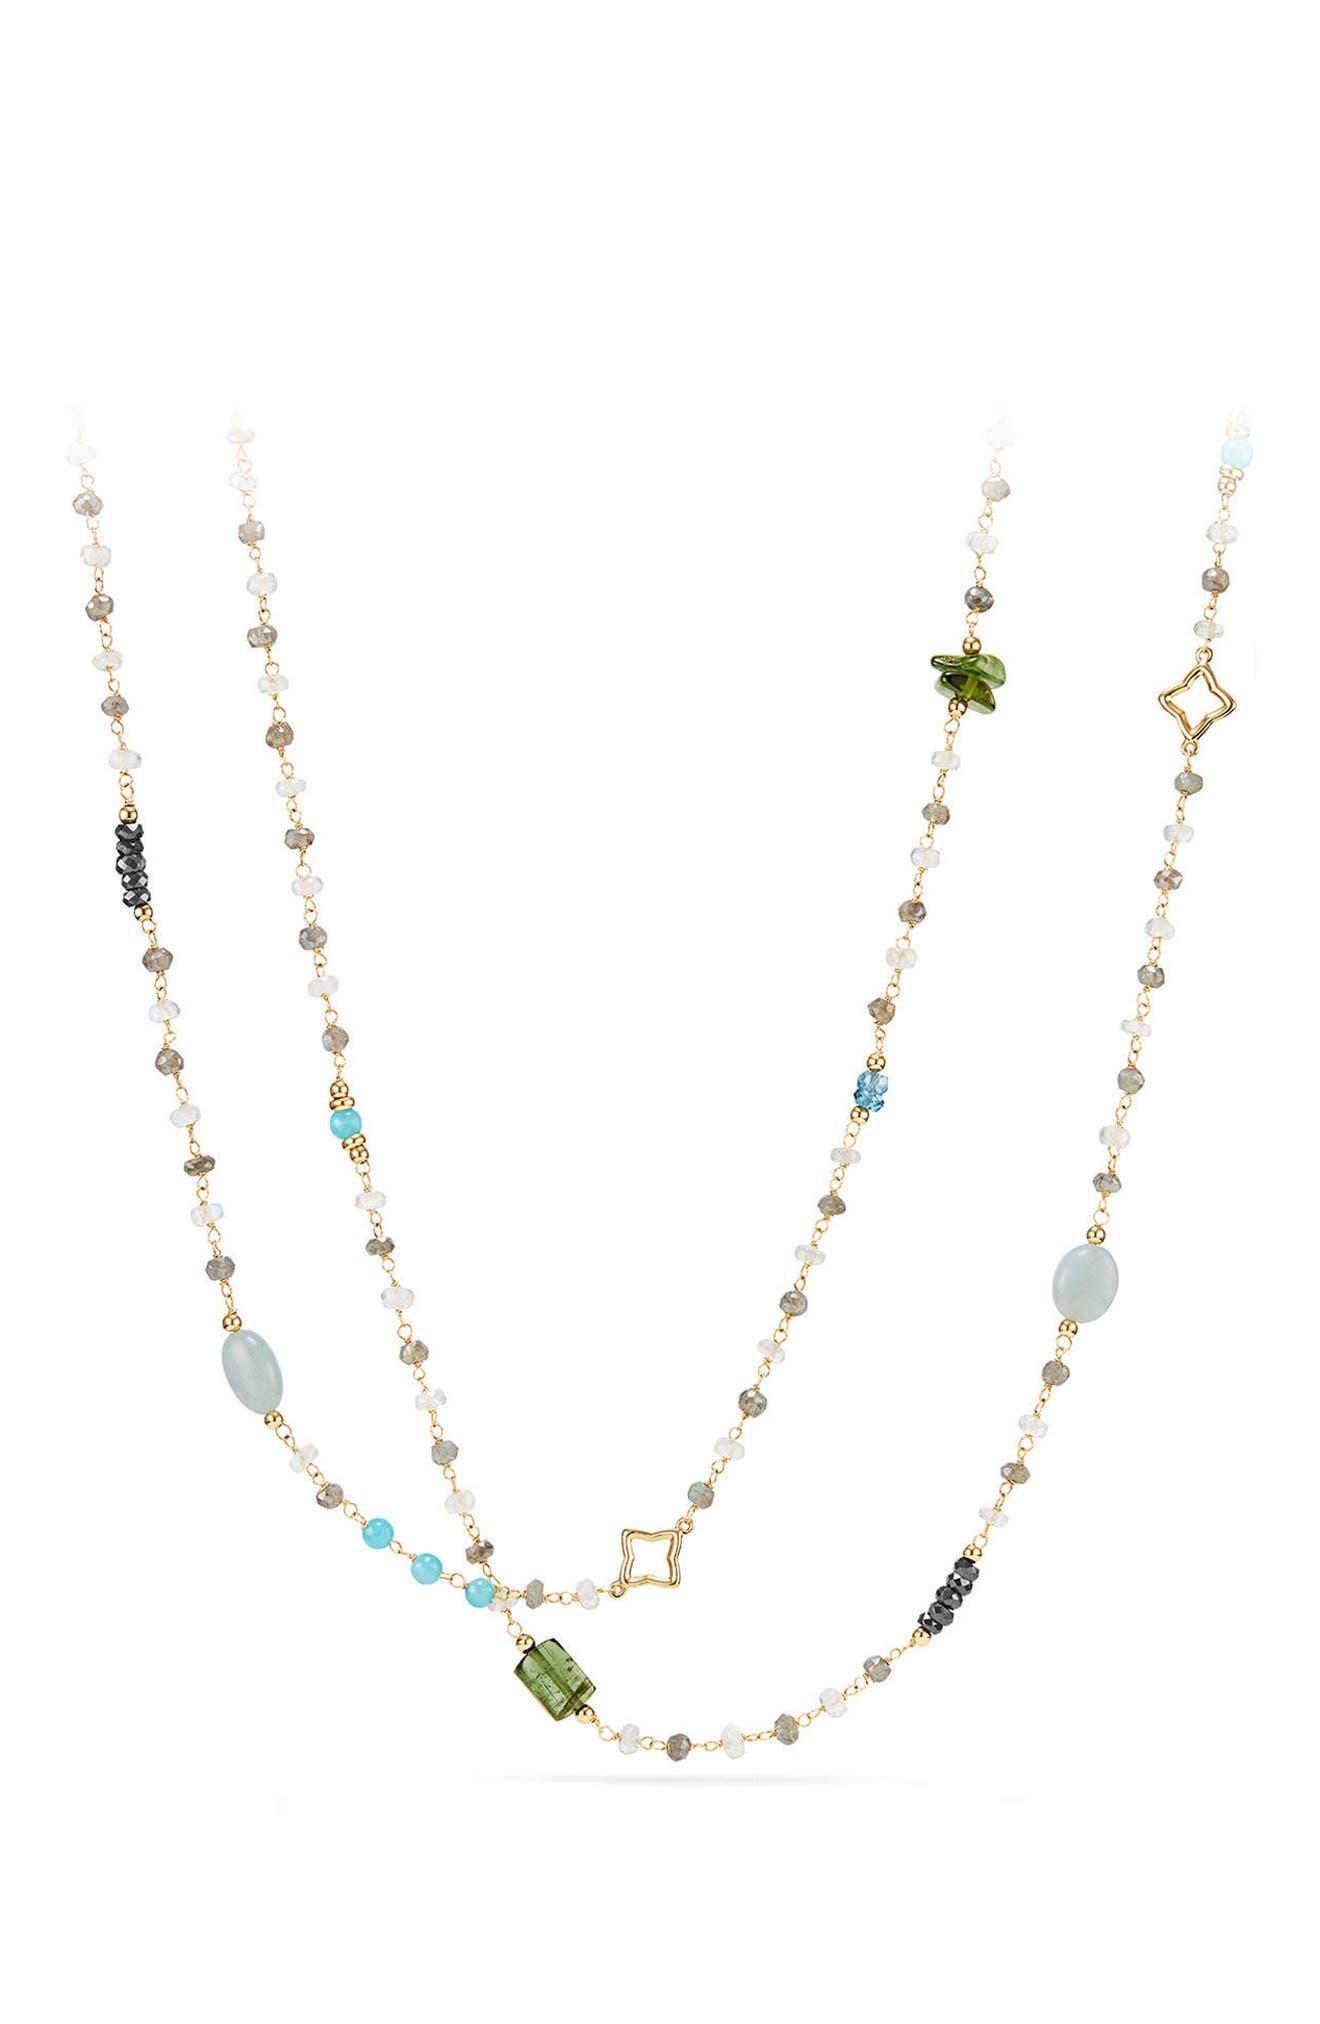 Main Image - David Yurman Long Bead & Chain Necklace with Semiprecious Stones in 18K Gold